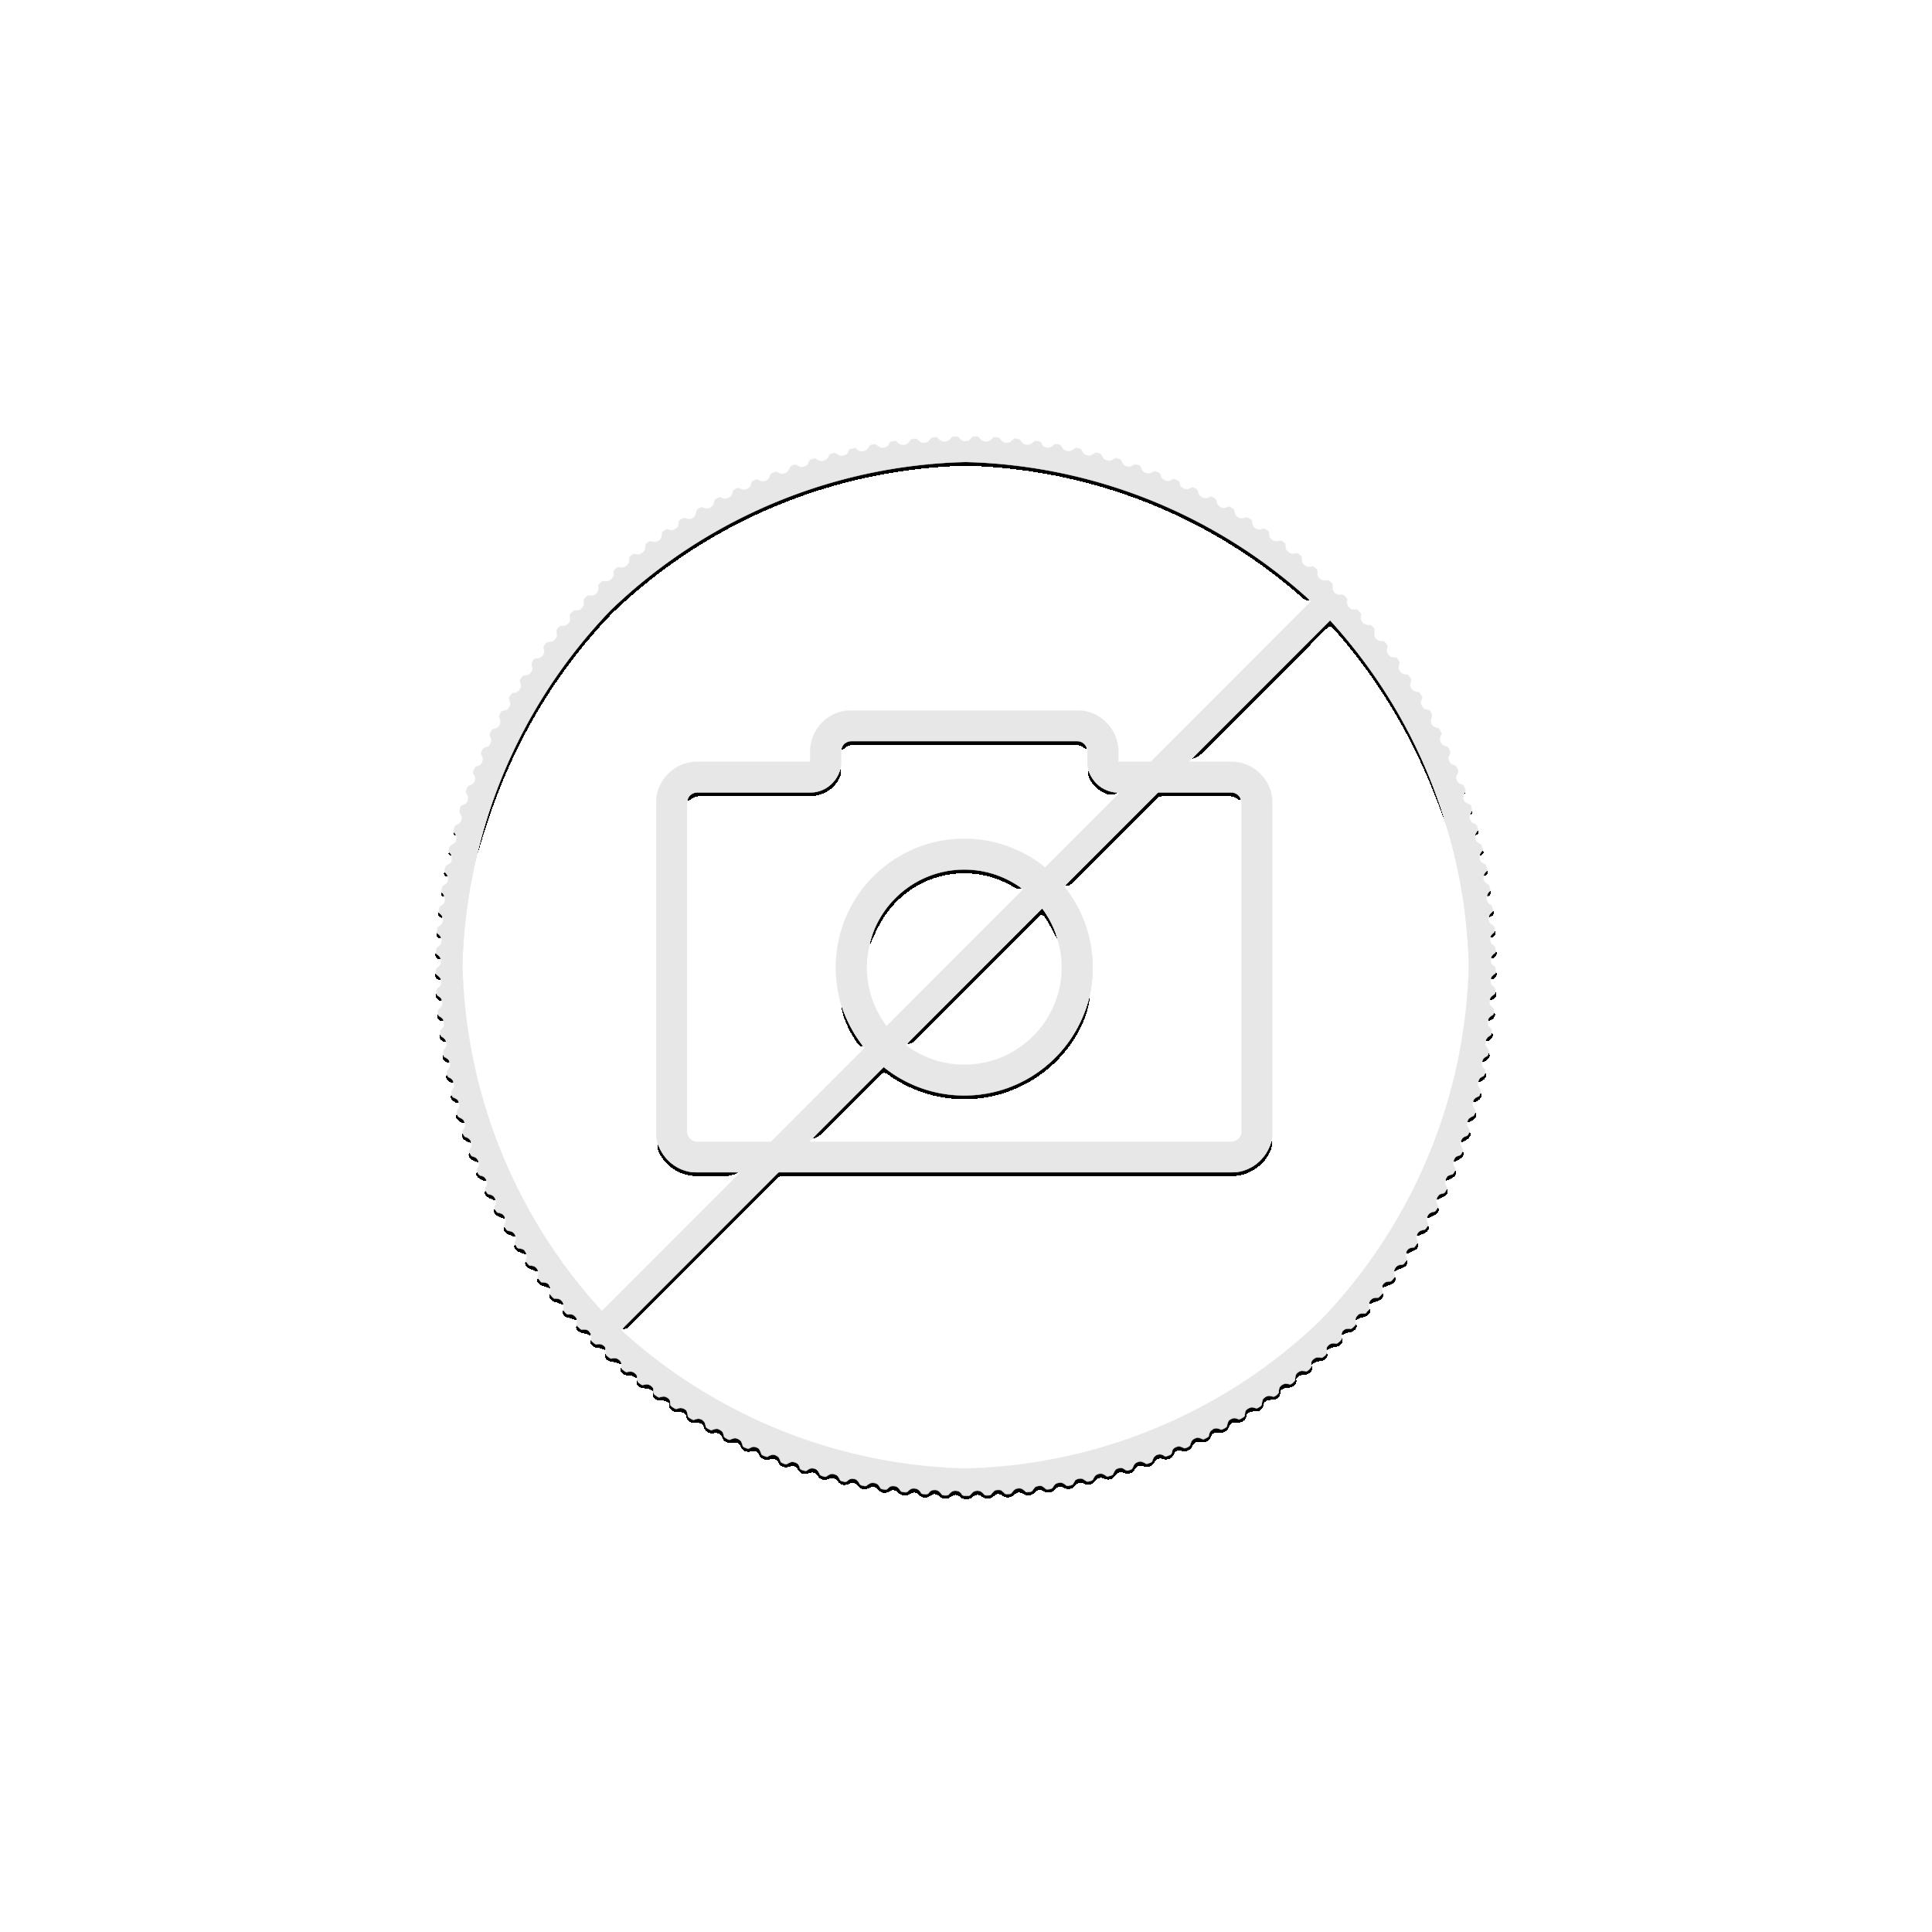 1 troy ounce gouden American Buffalo munt 2020